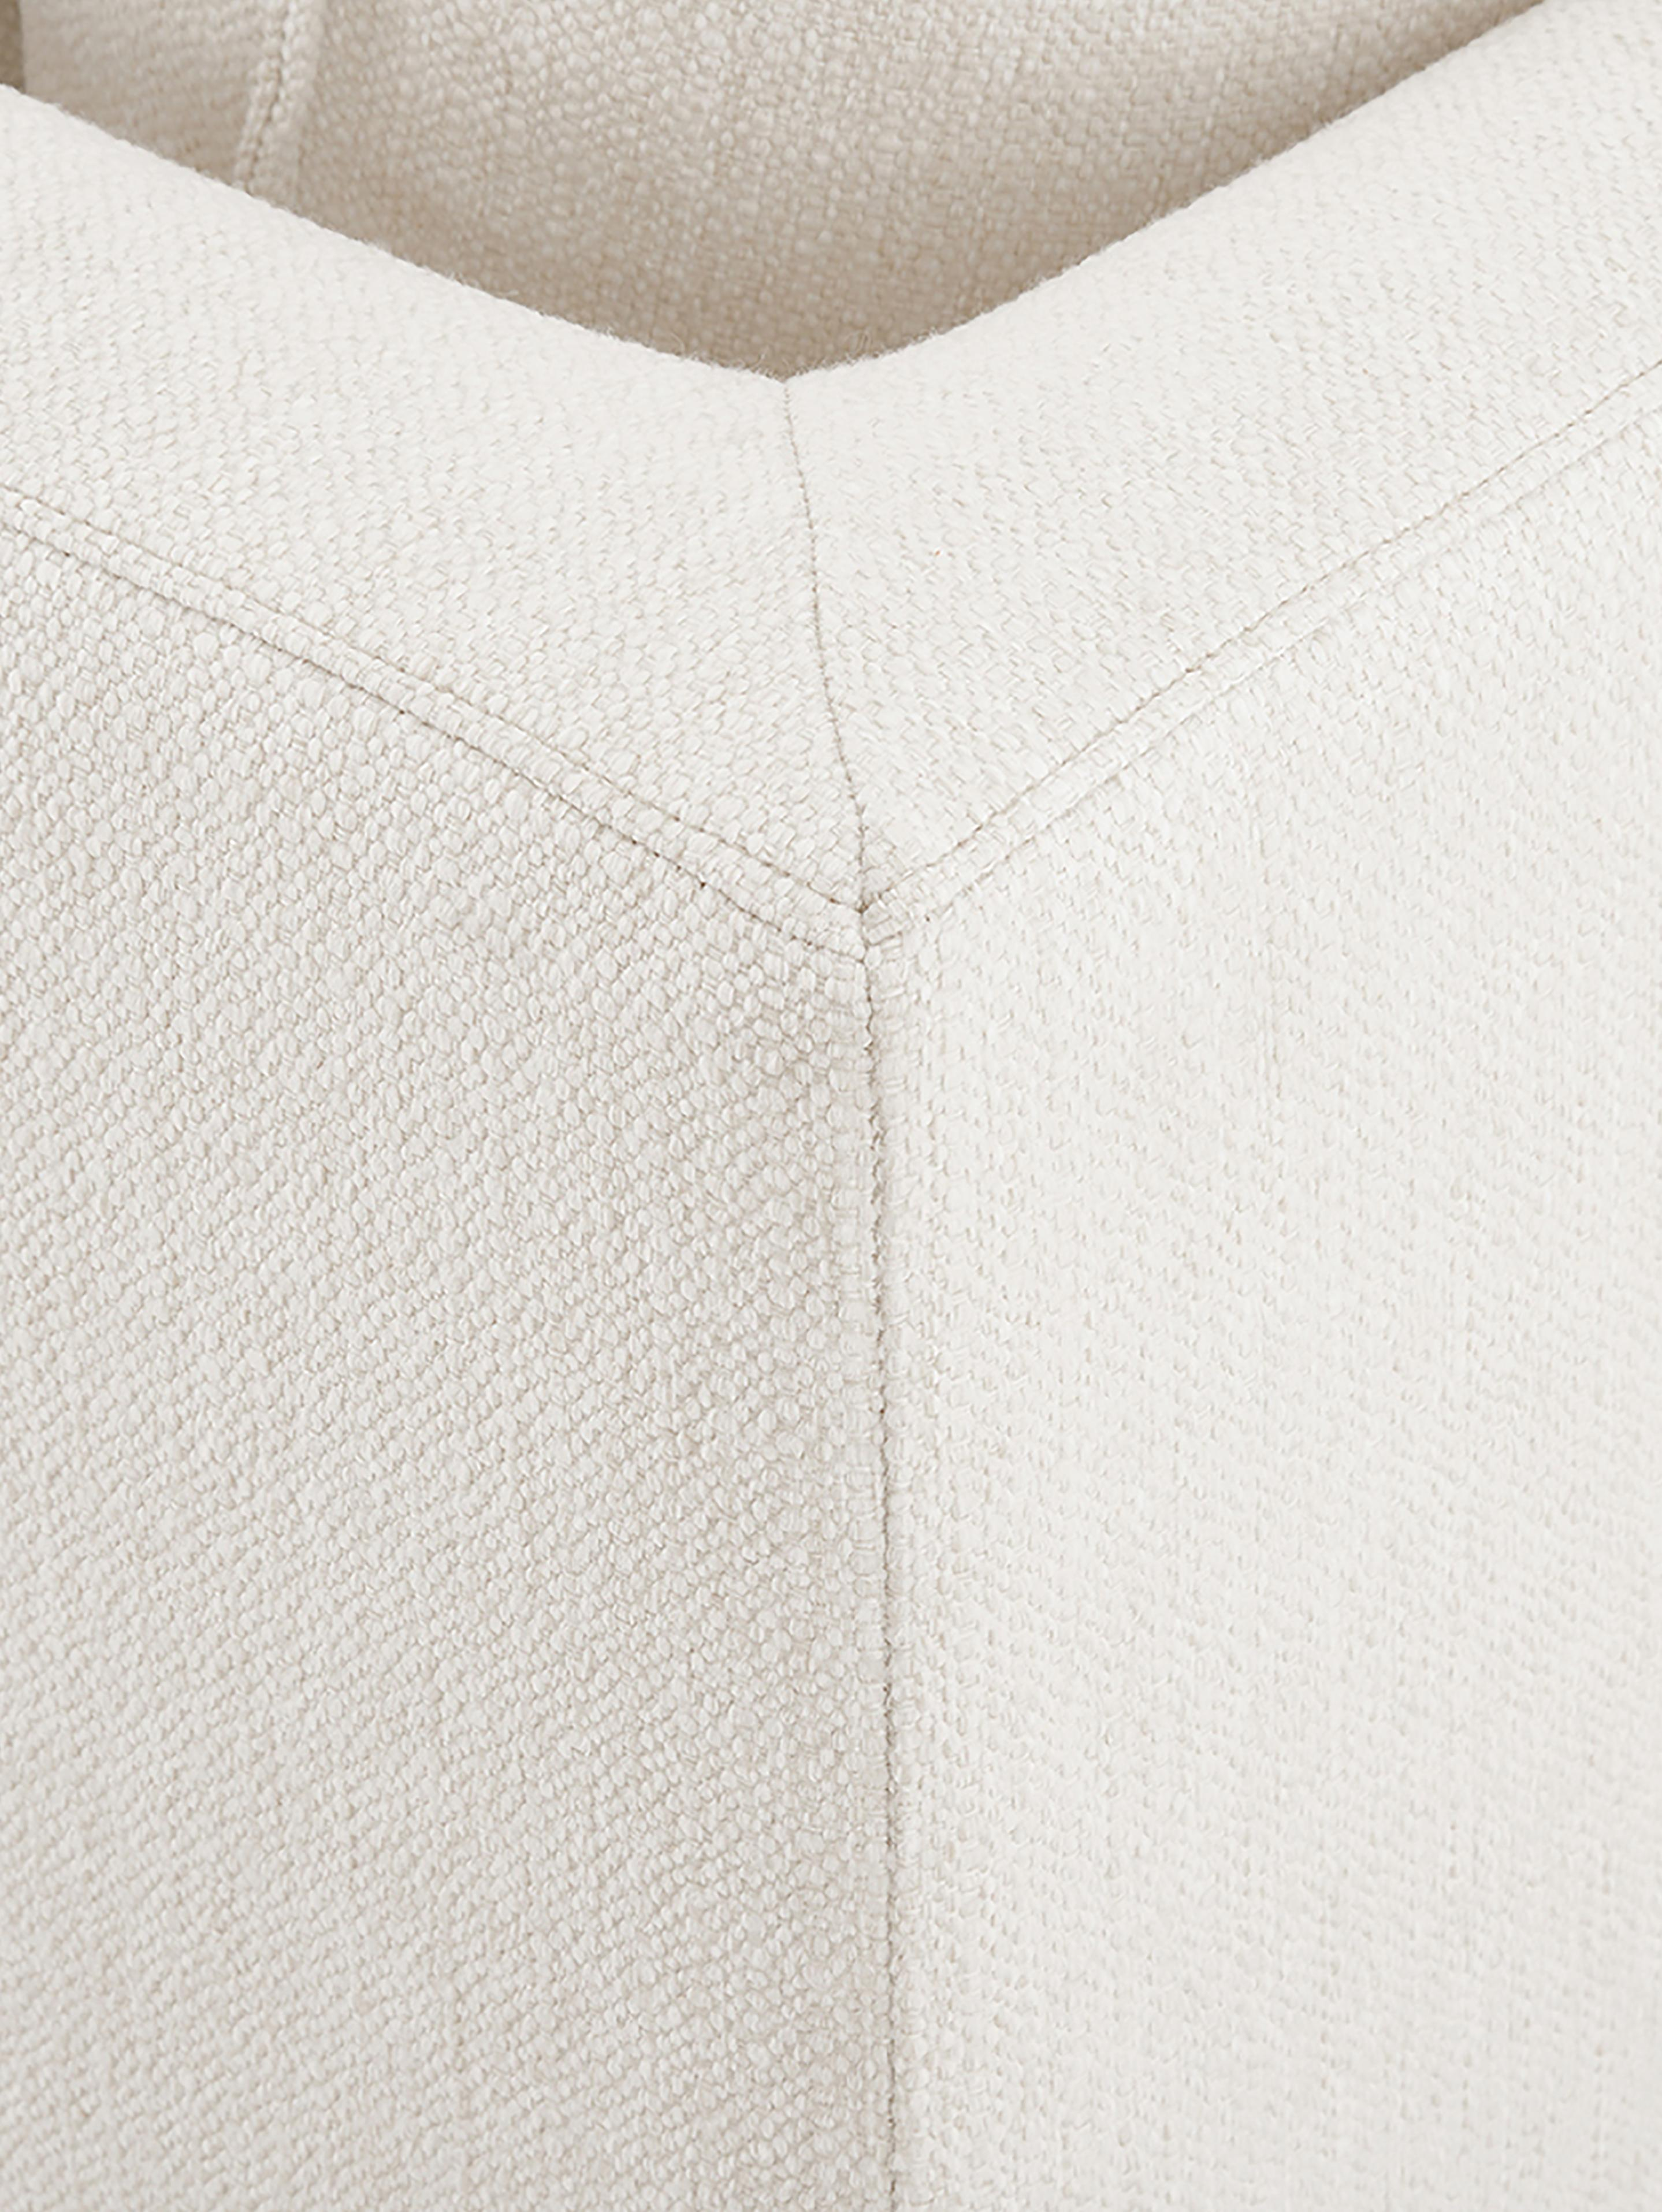 Grote hoekbank Tribeca, Bekleding: polyester, Zitvlak: schuimstof, vezelmateriaa, Frame: massief grenenhout, Poten: gelakt massief grenenhout, Geweven stof beige, B 315 x D 228 cm